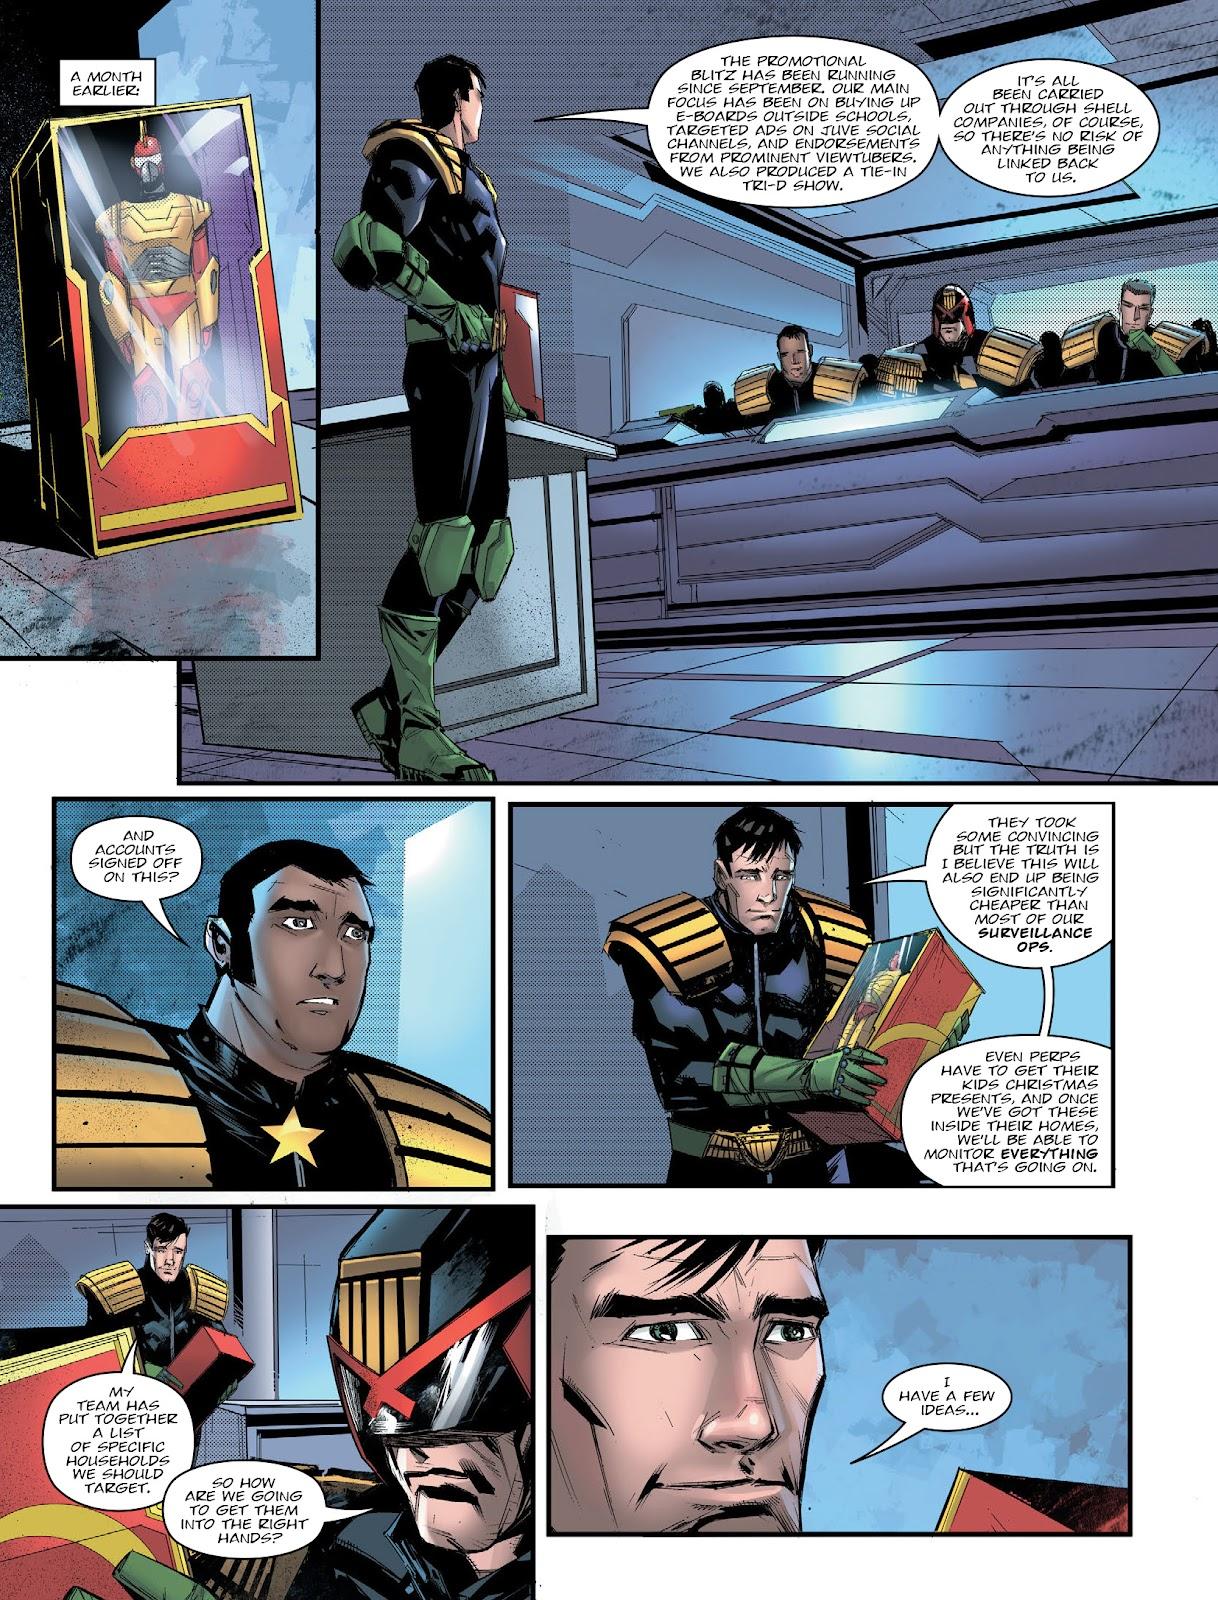 Judge Dredd Megazine (Vol. 5) issue 427 - Page 8